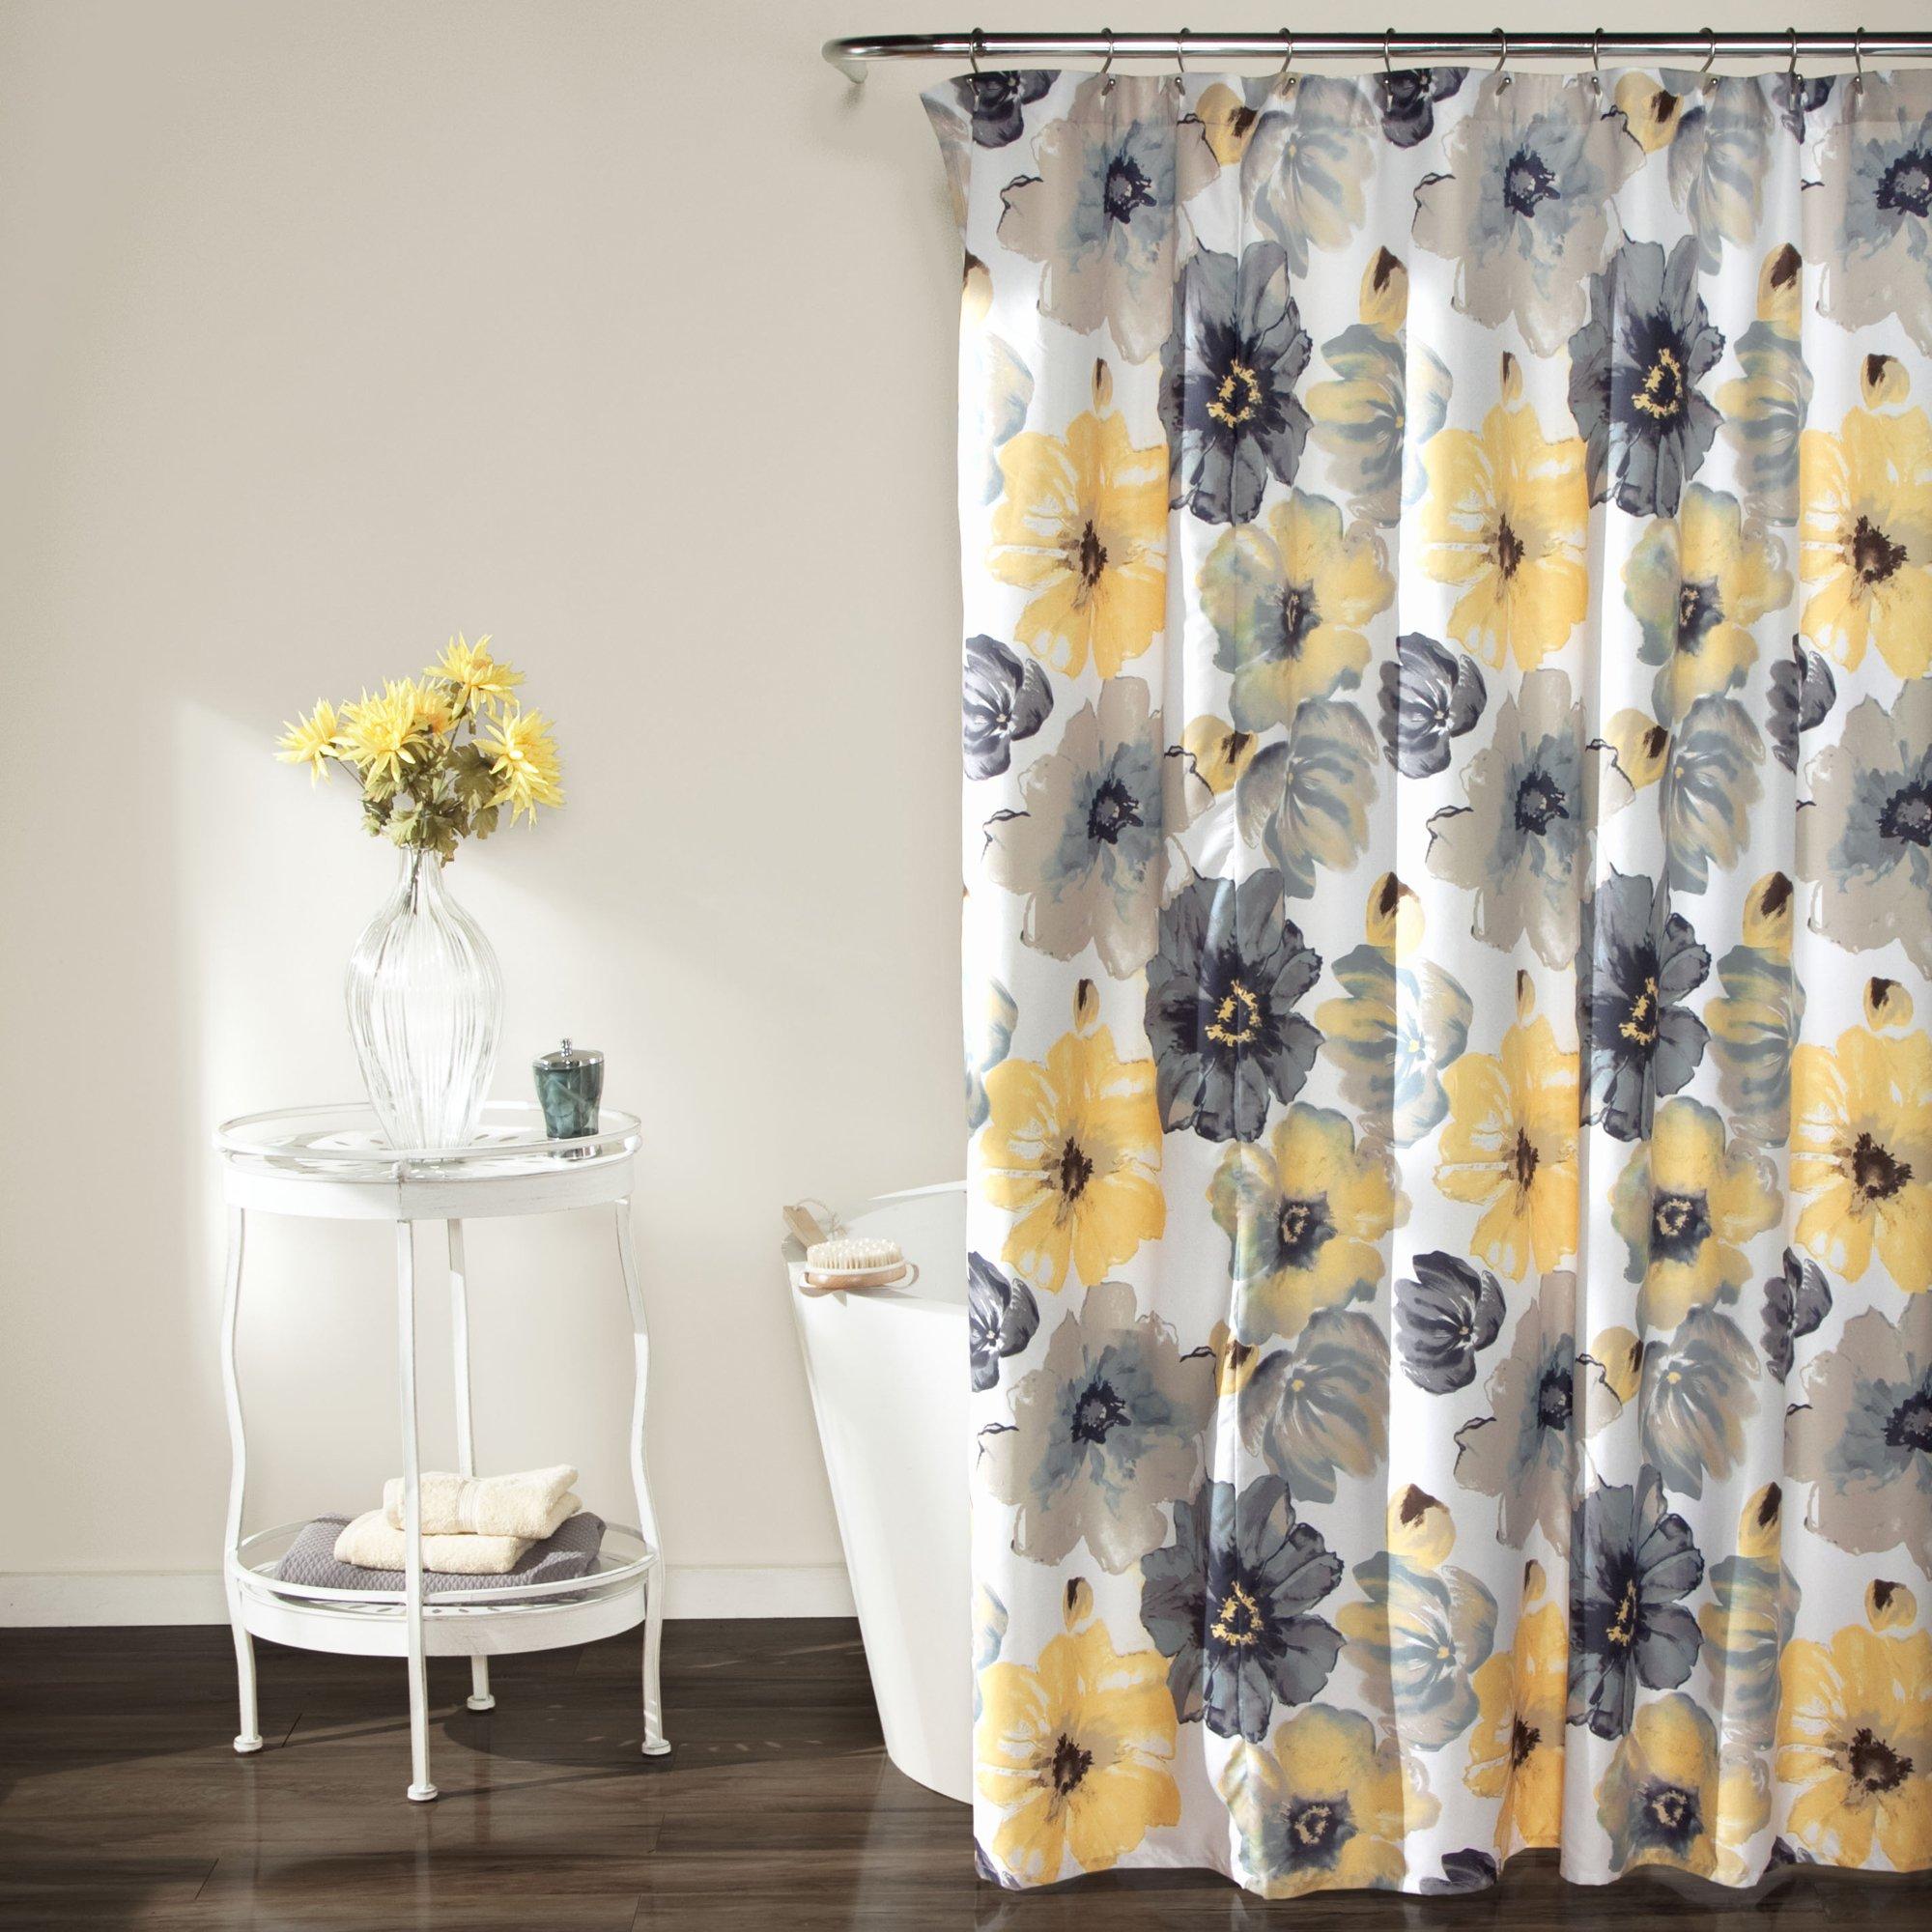 Lush Decor Leah Shower Curtain - Bathroom Flower Floral Large Blooms Fabric Print Design, 72'' x 72'', Yellow/Gray